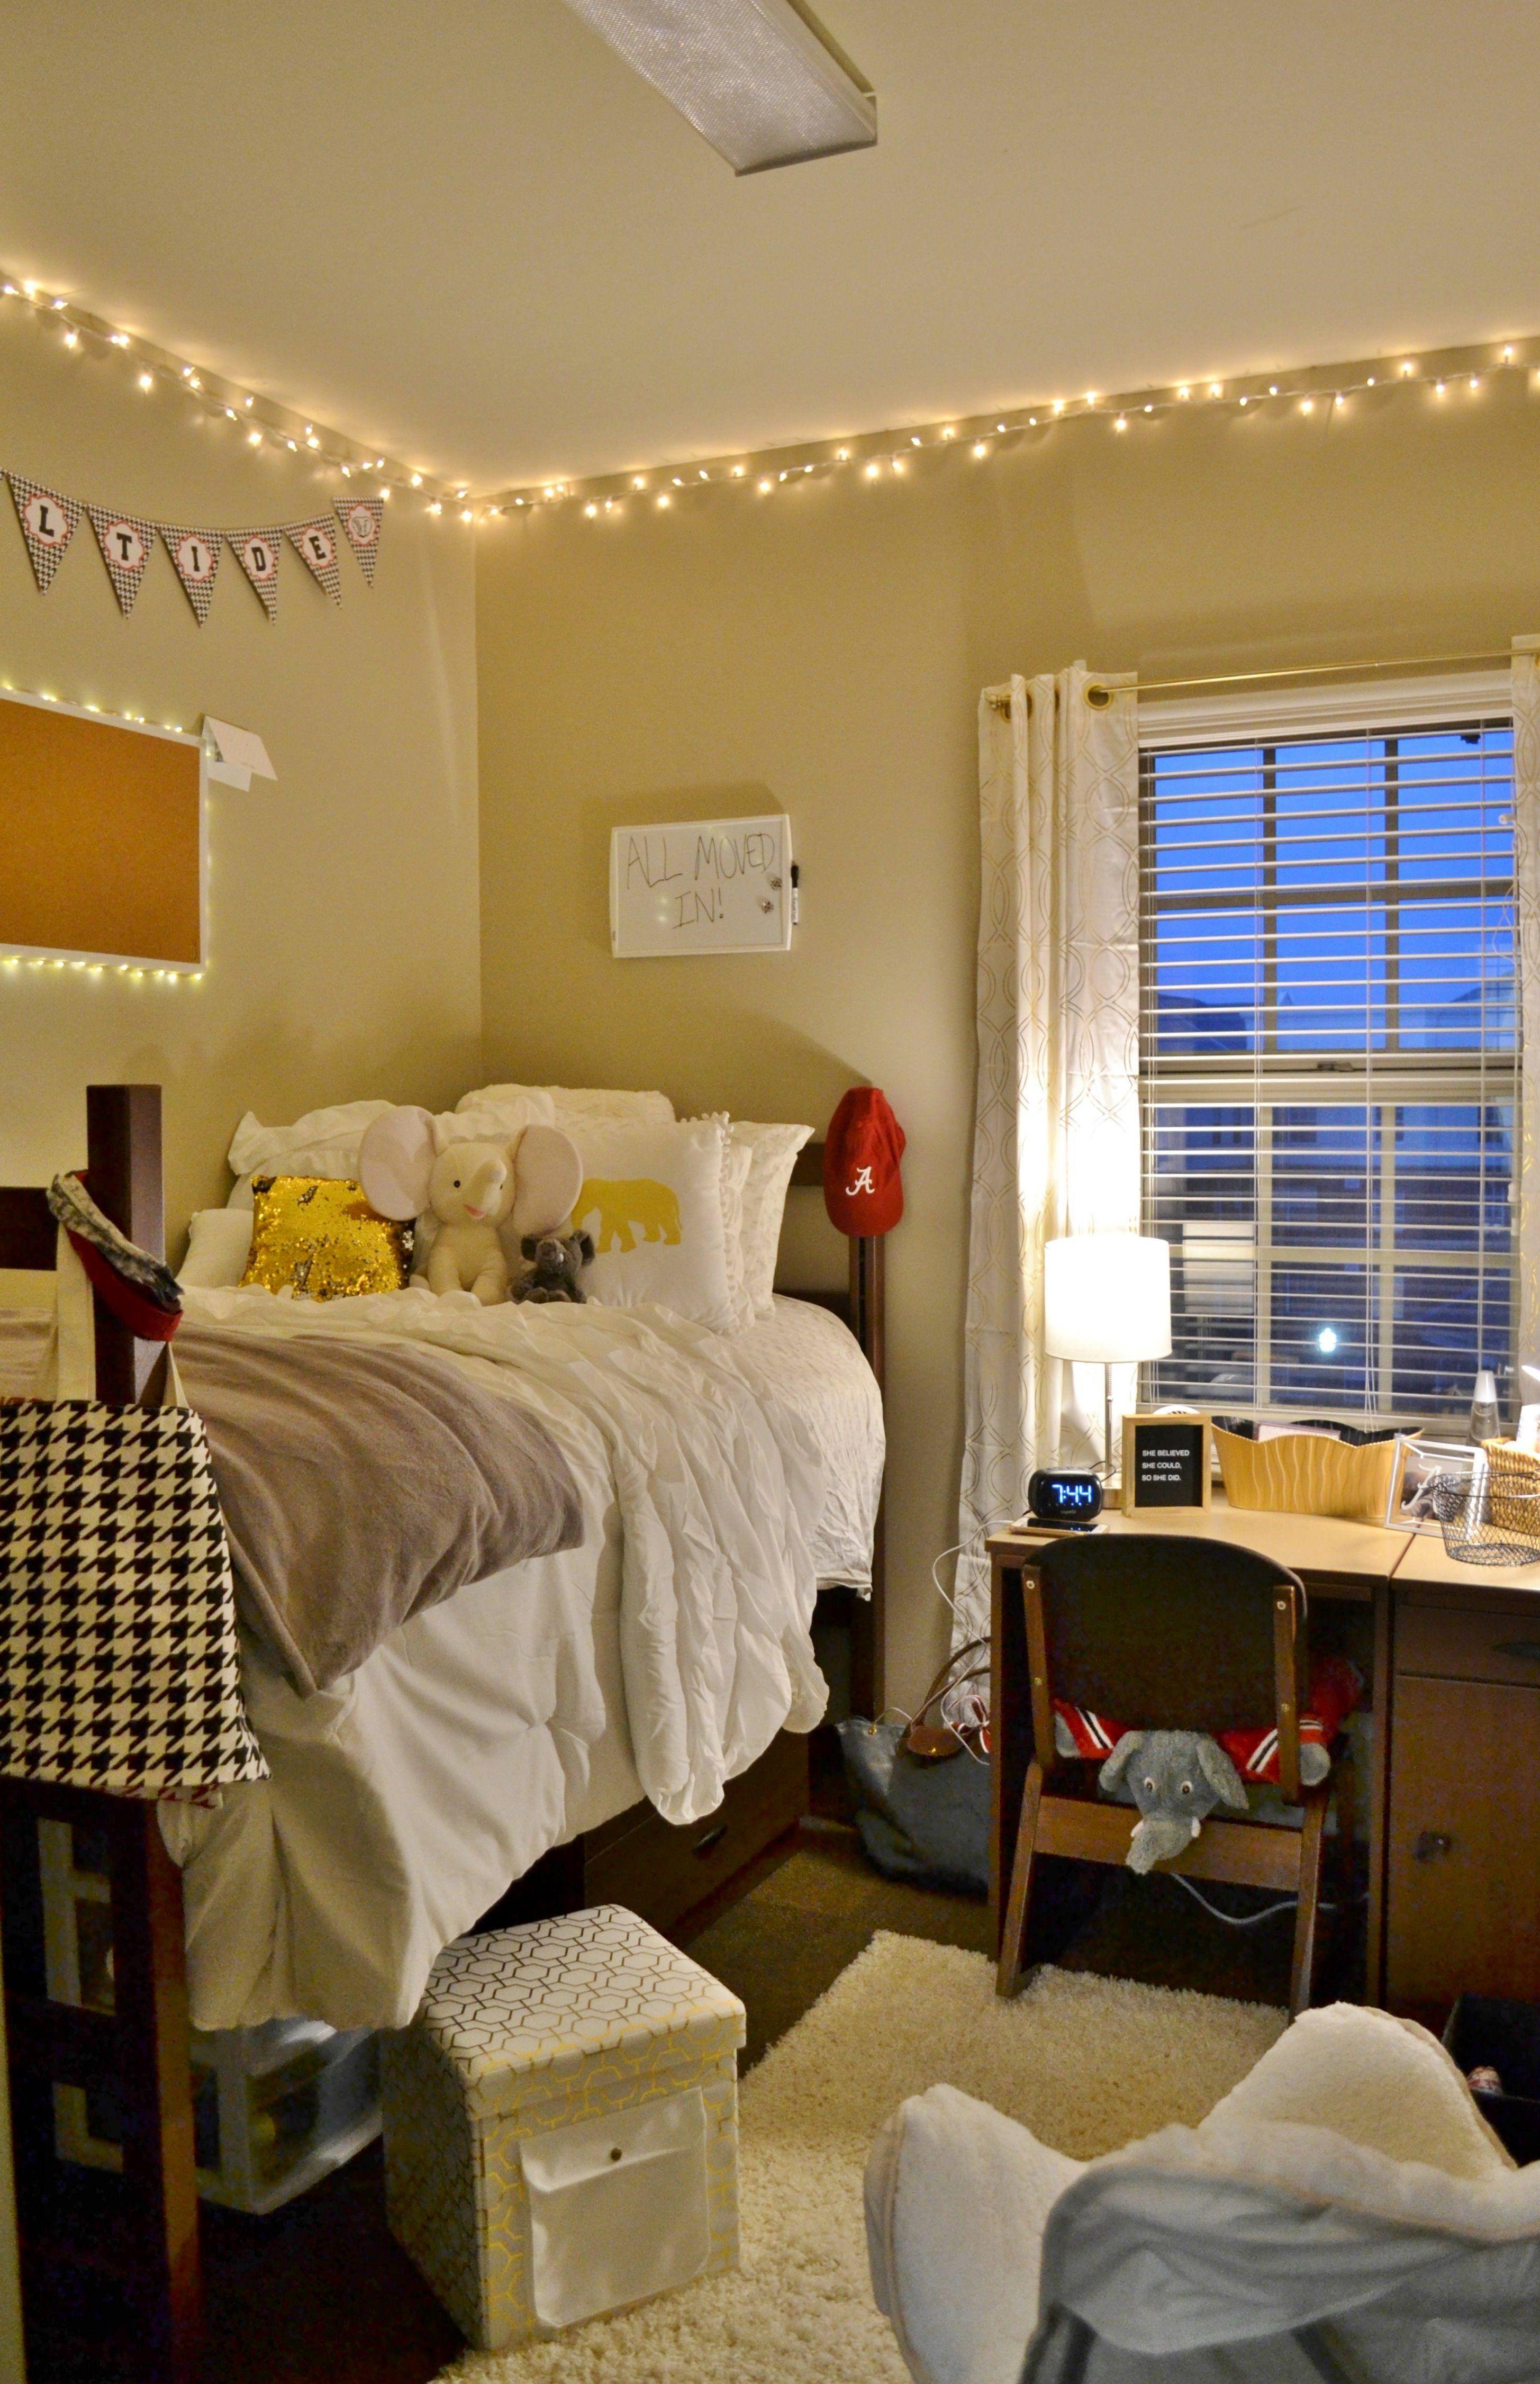 Dorm University Of Alabama Ridgecrest South North Tower